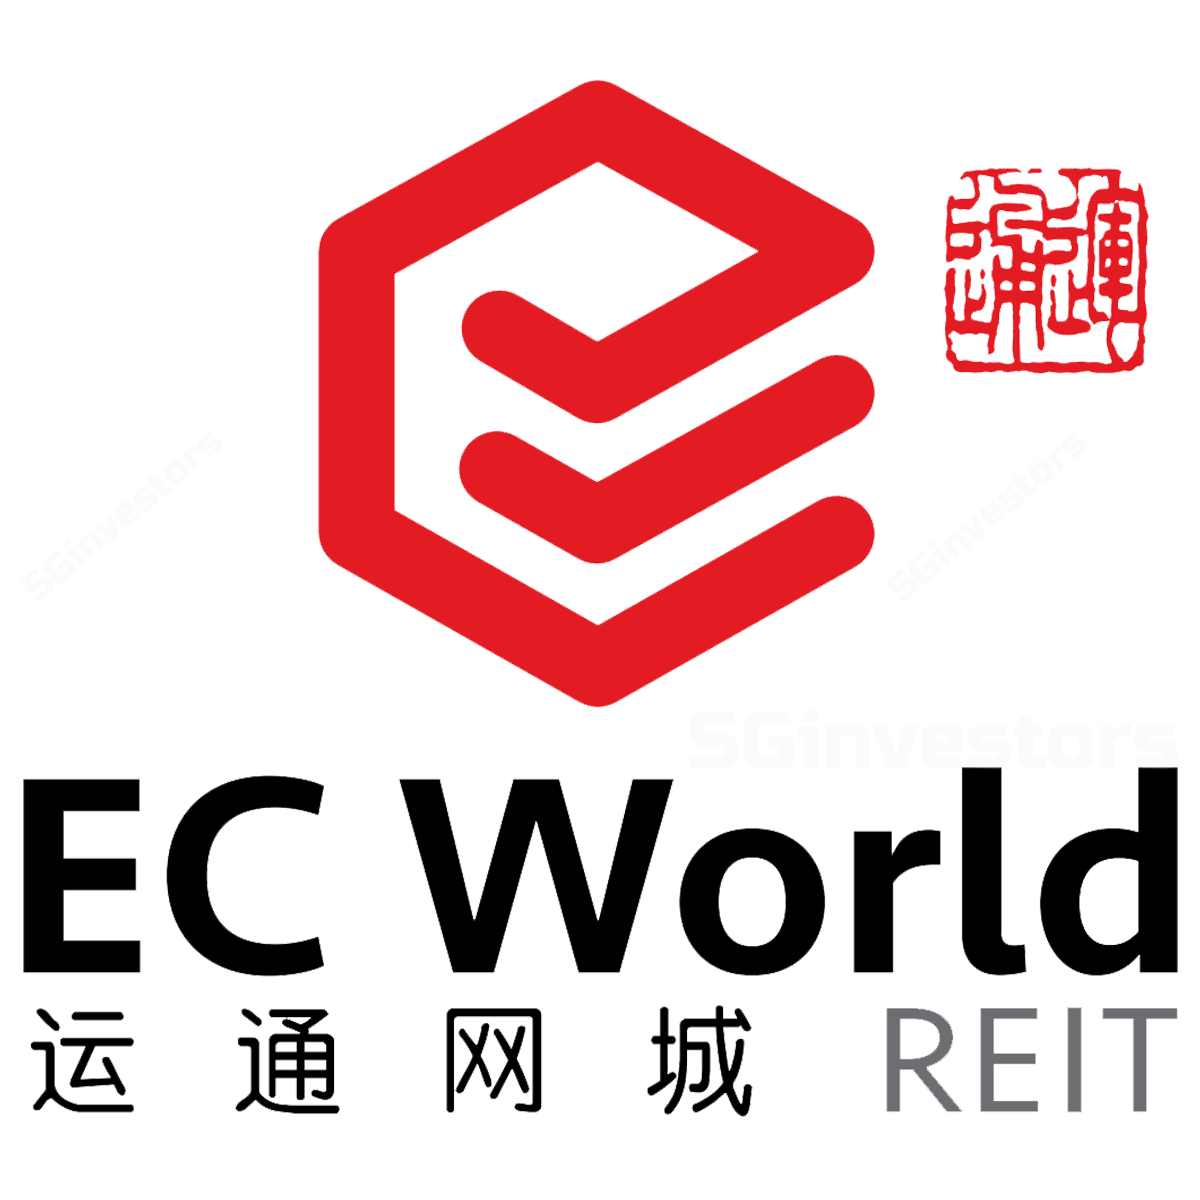 EC WORLD REIT (SGX:BWCU) | SGinvestors.io